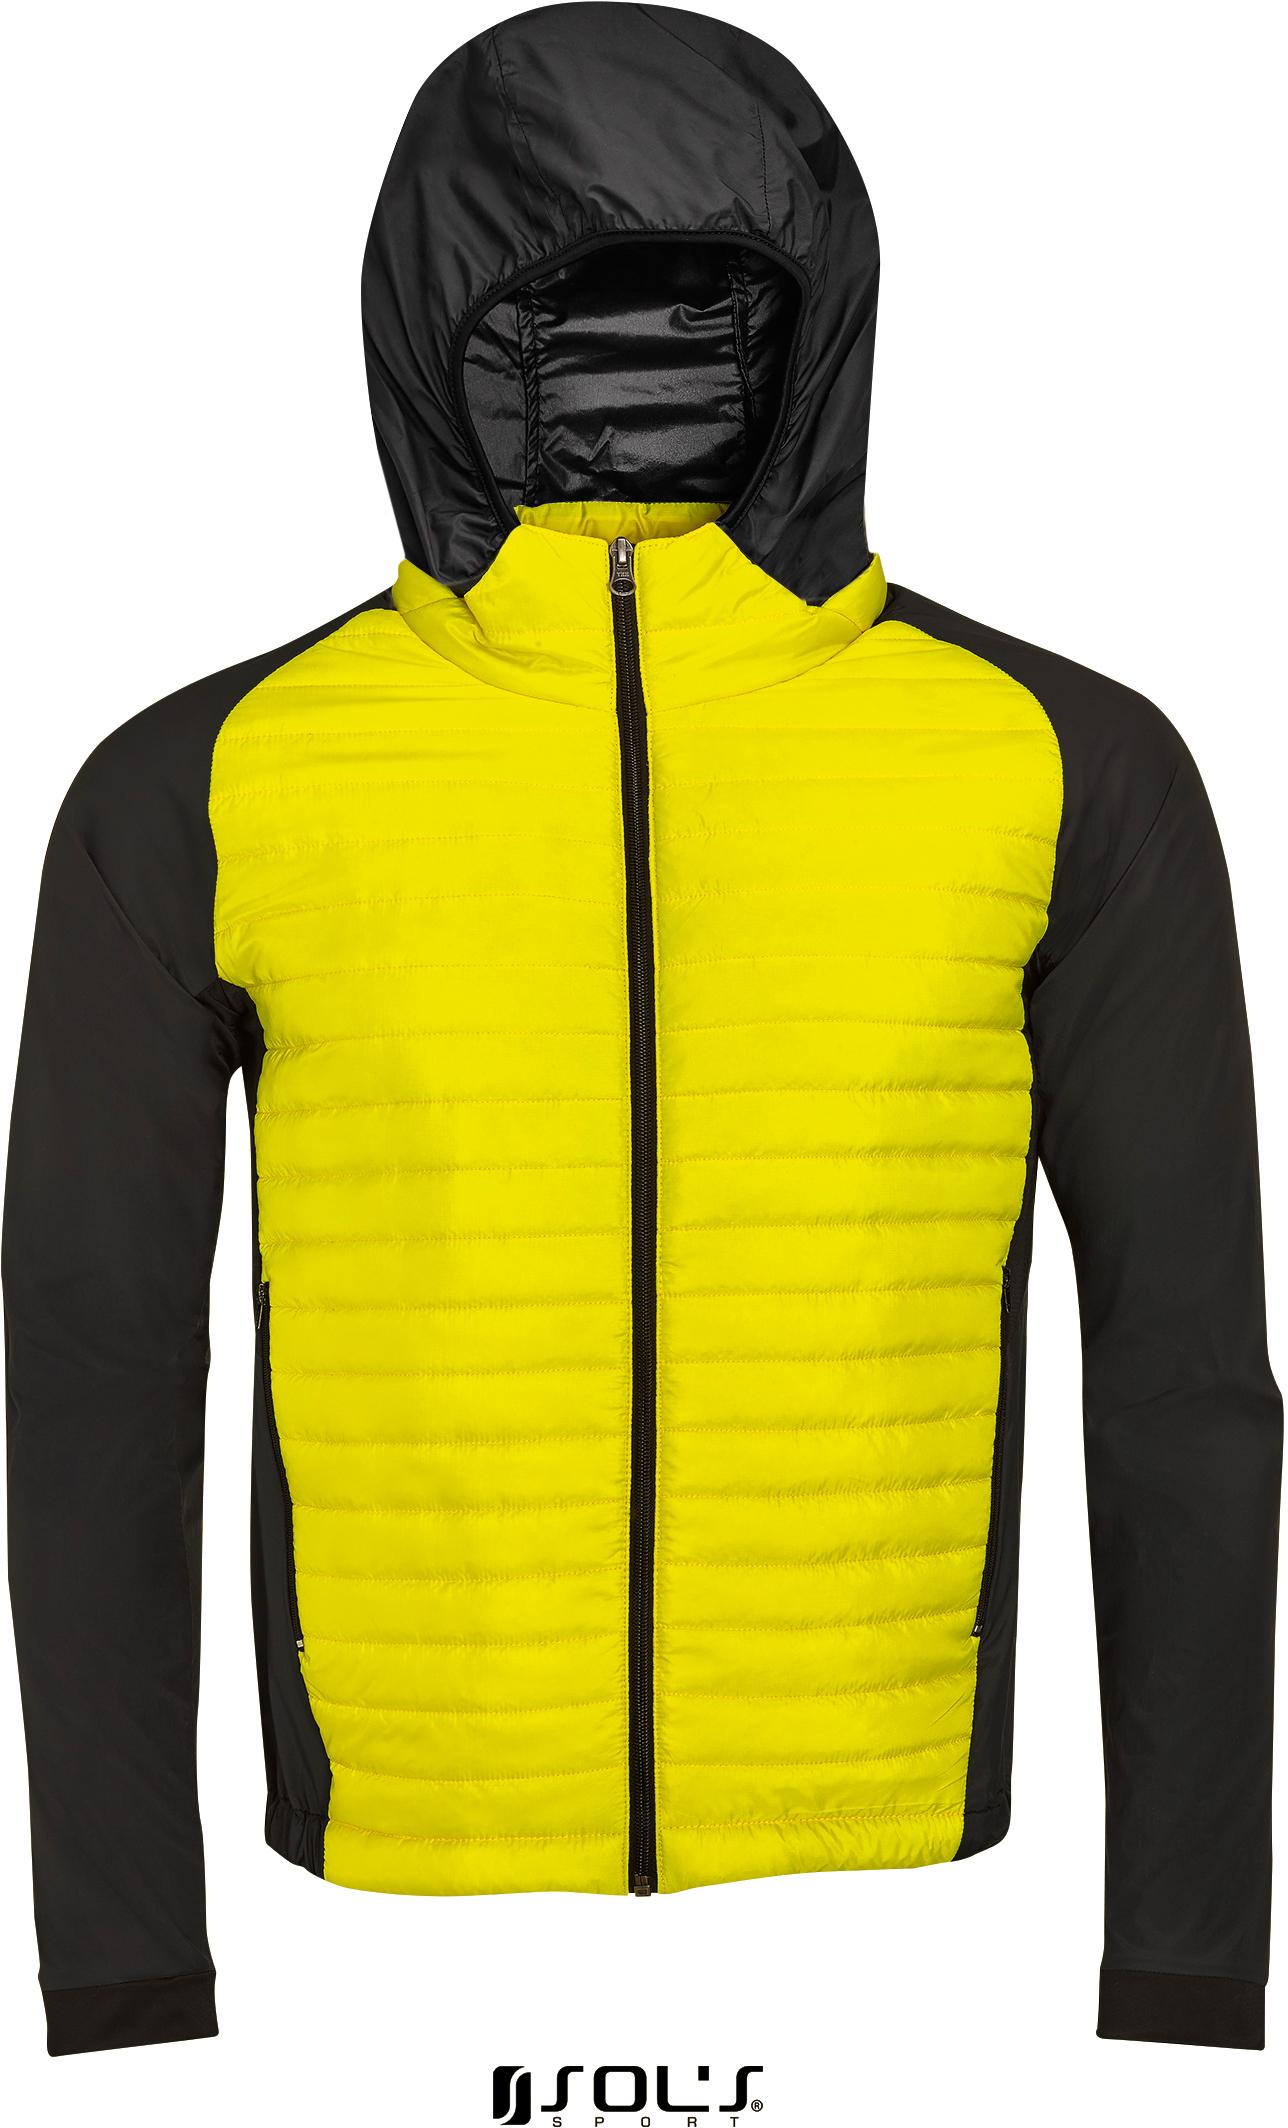 Pánská běžecká péřová bunda